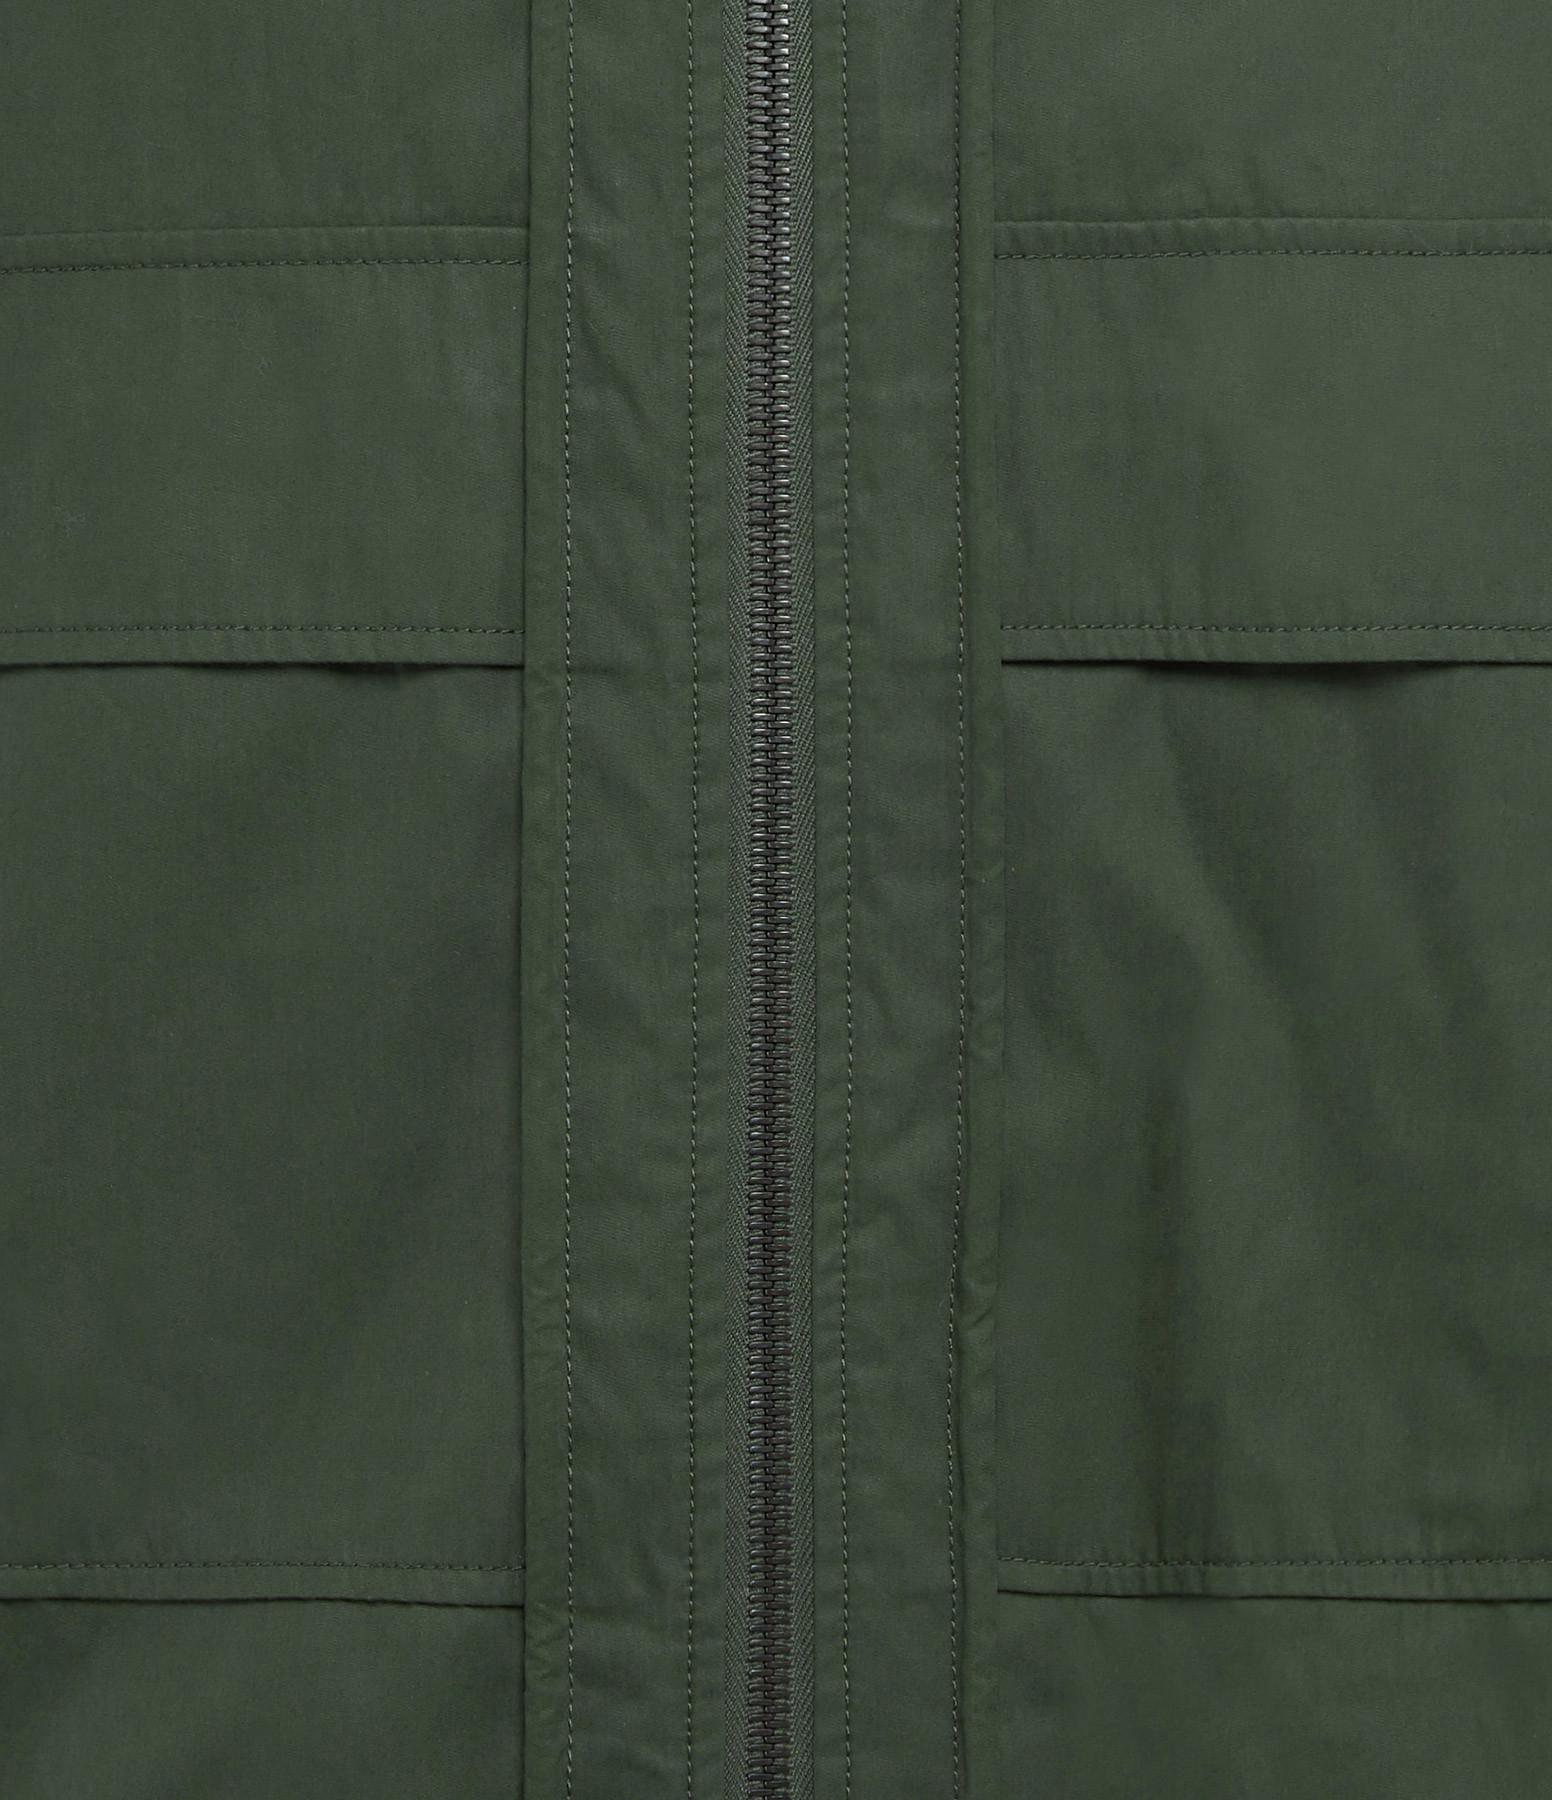 YVES SALOMON - ARMY - Veste Coton Renard Vert